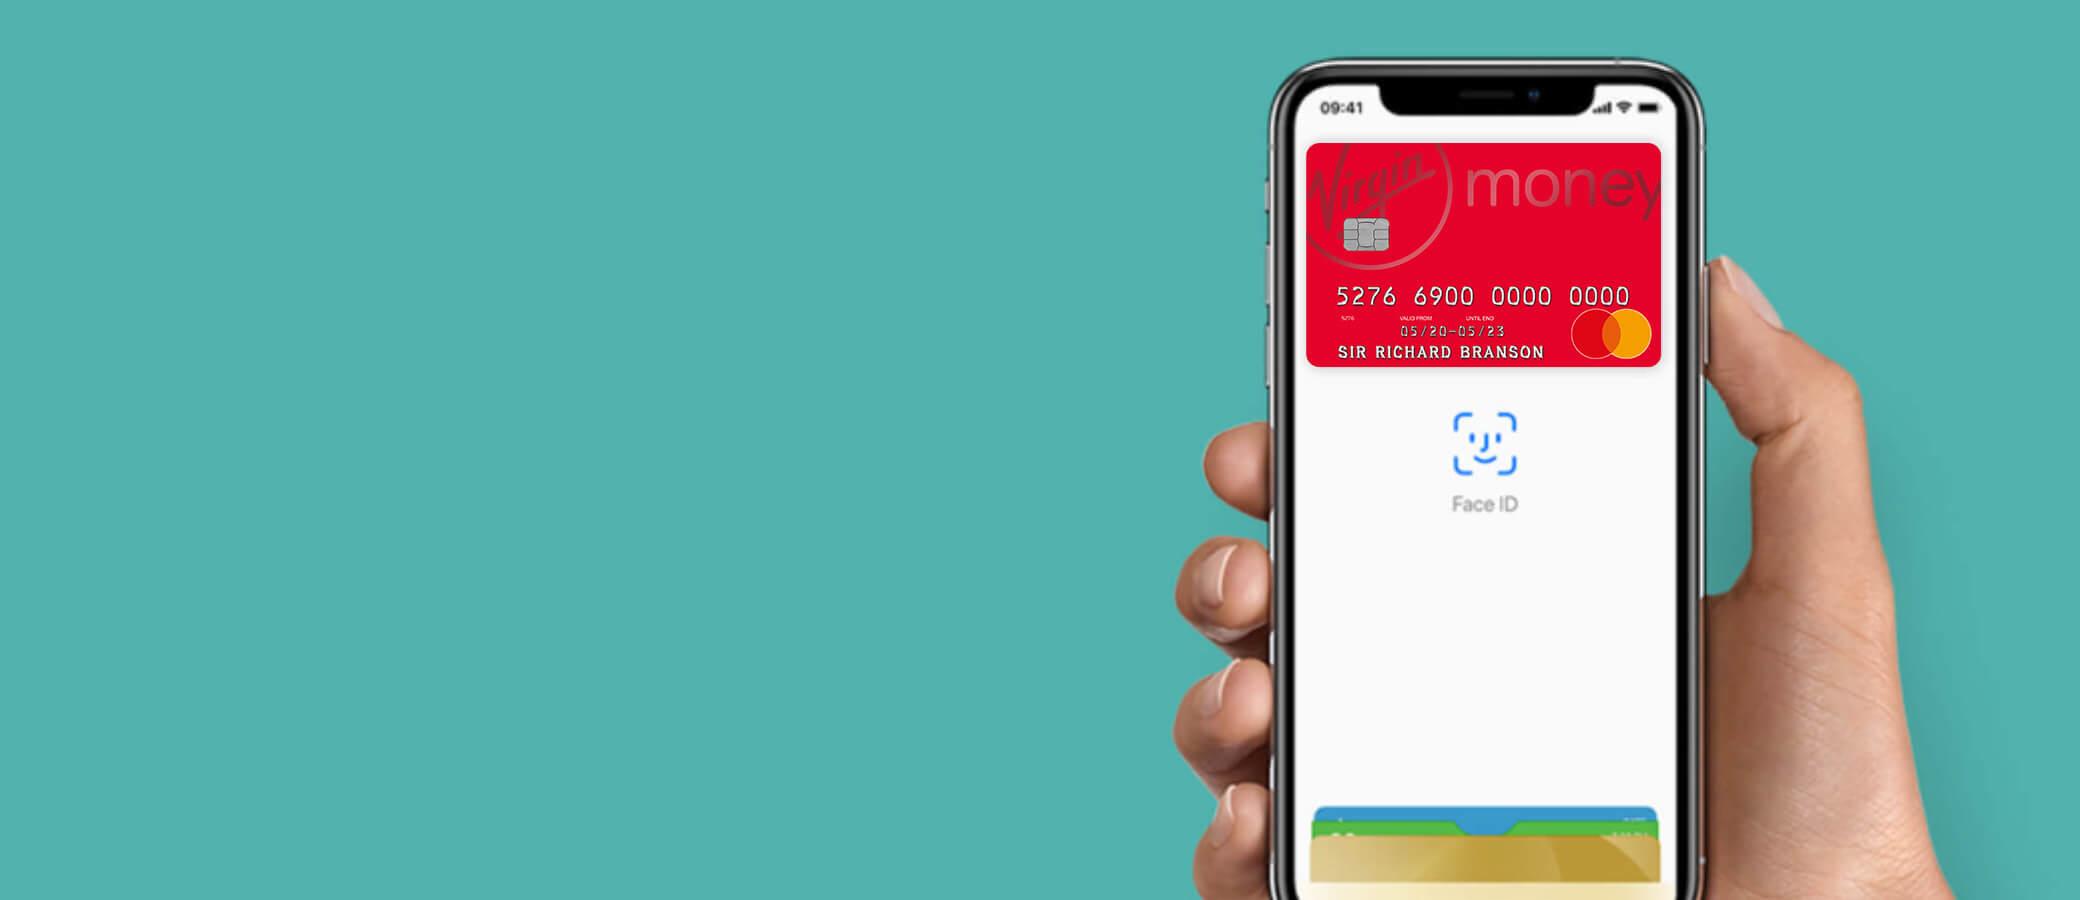 Virgin Money UK - Credit cards, Mortgages, Savings, ISAs